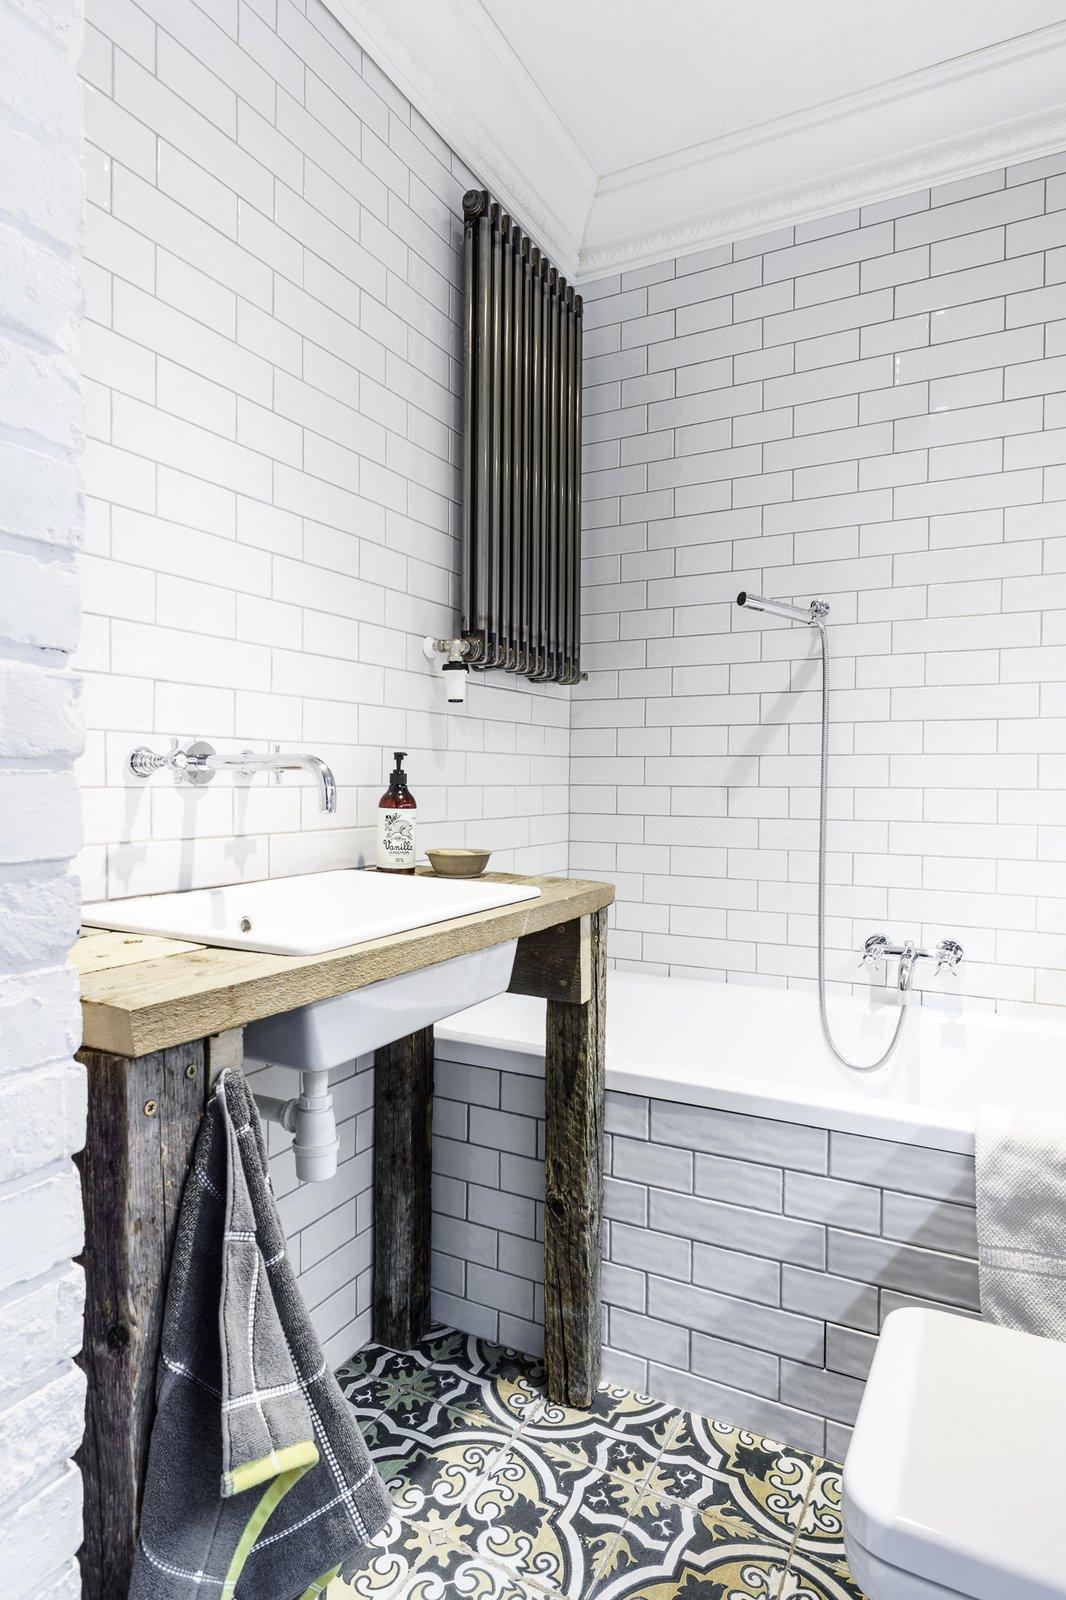 Bath, Pedestal, Soaking, Wood, Drop In, Subway Tile, and Ceramic Tile  Best Bath Drop In Soaking Ceramic Tile Photos from Loft in Poland